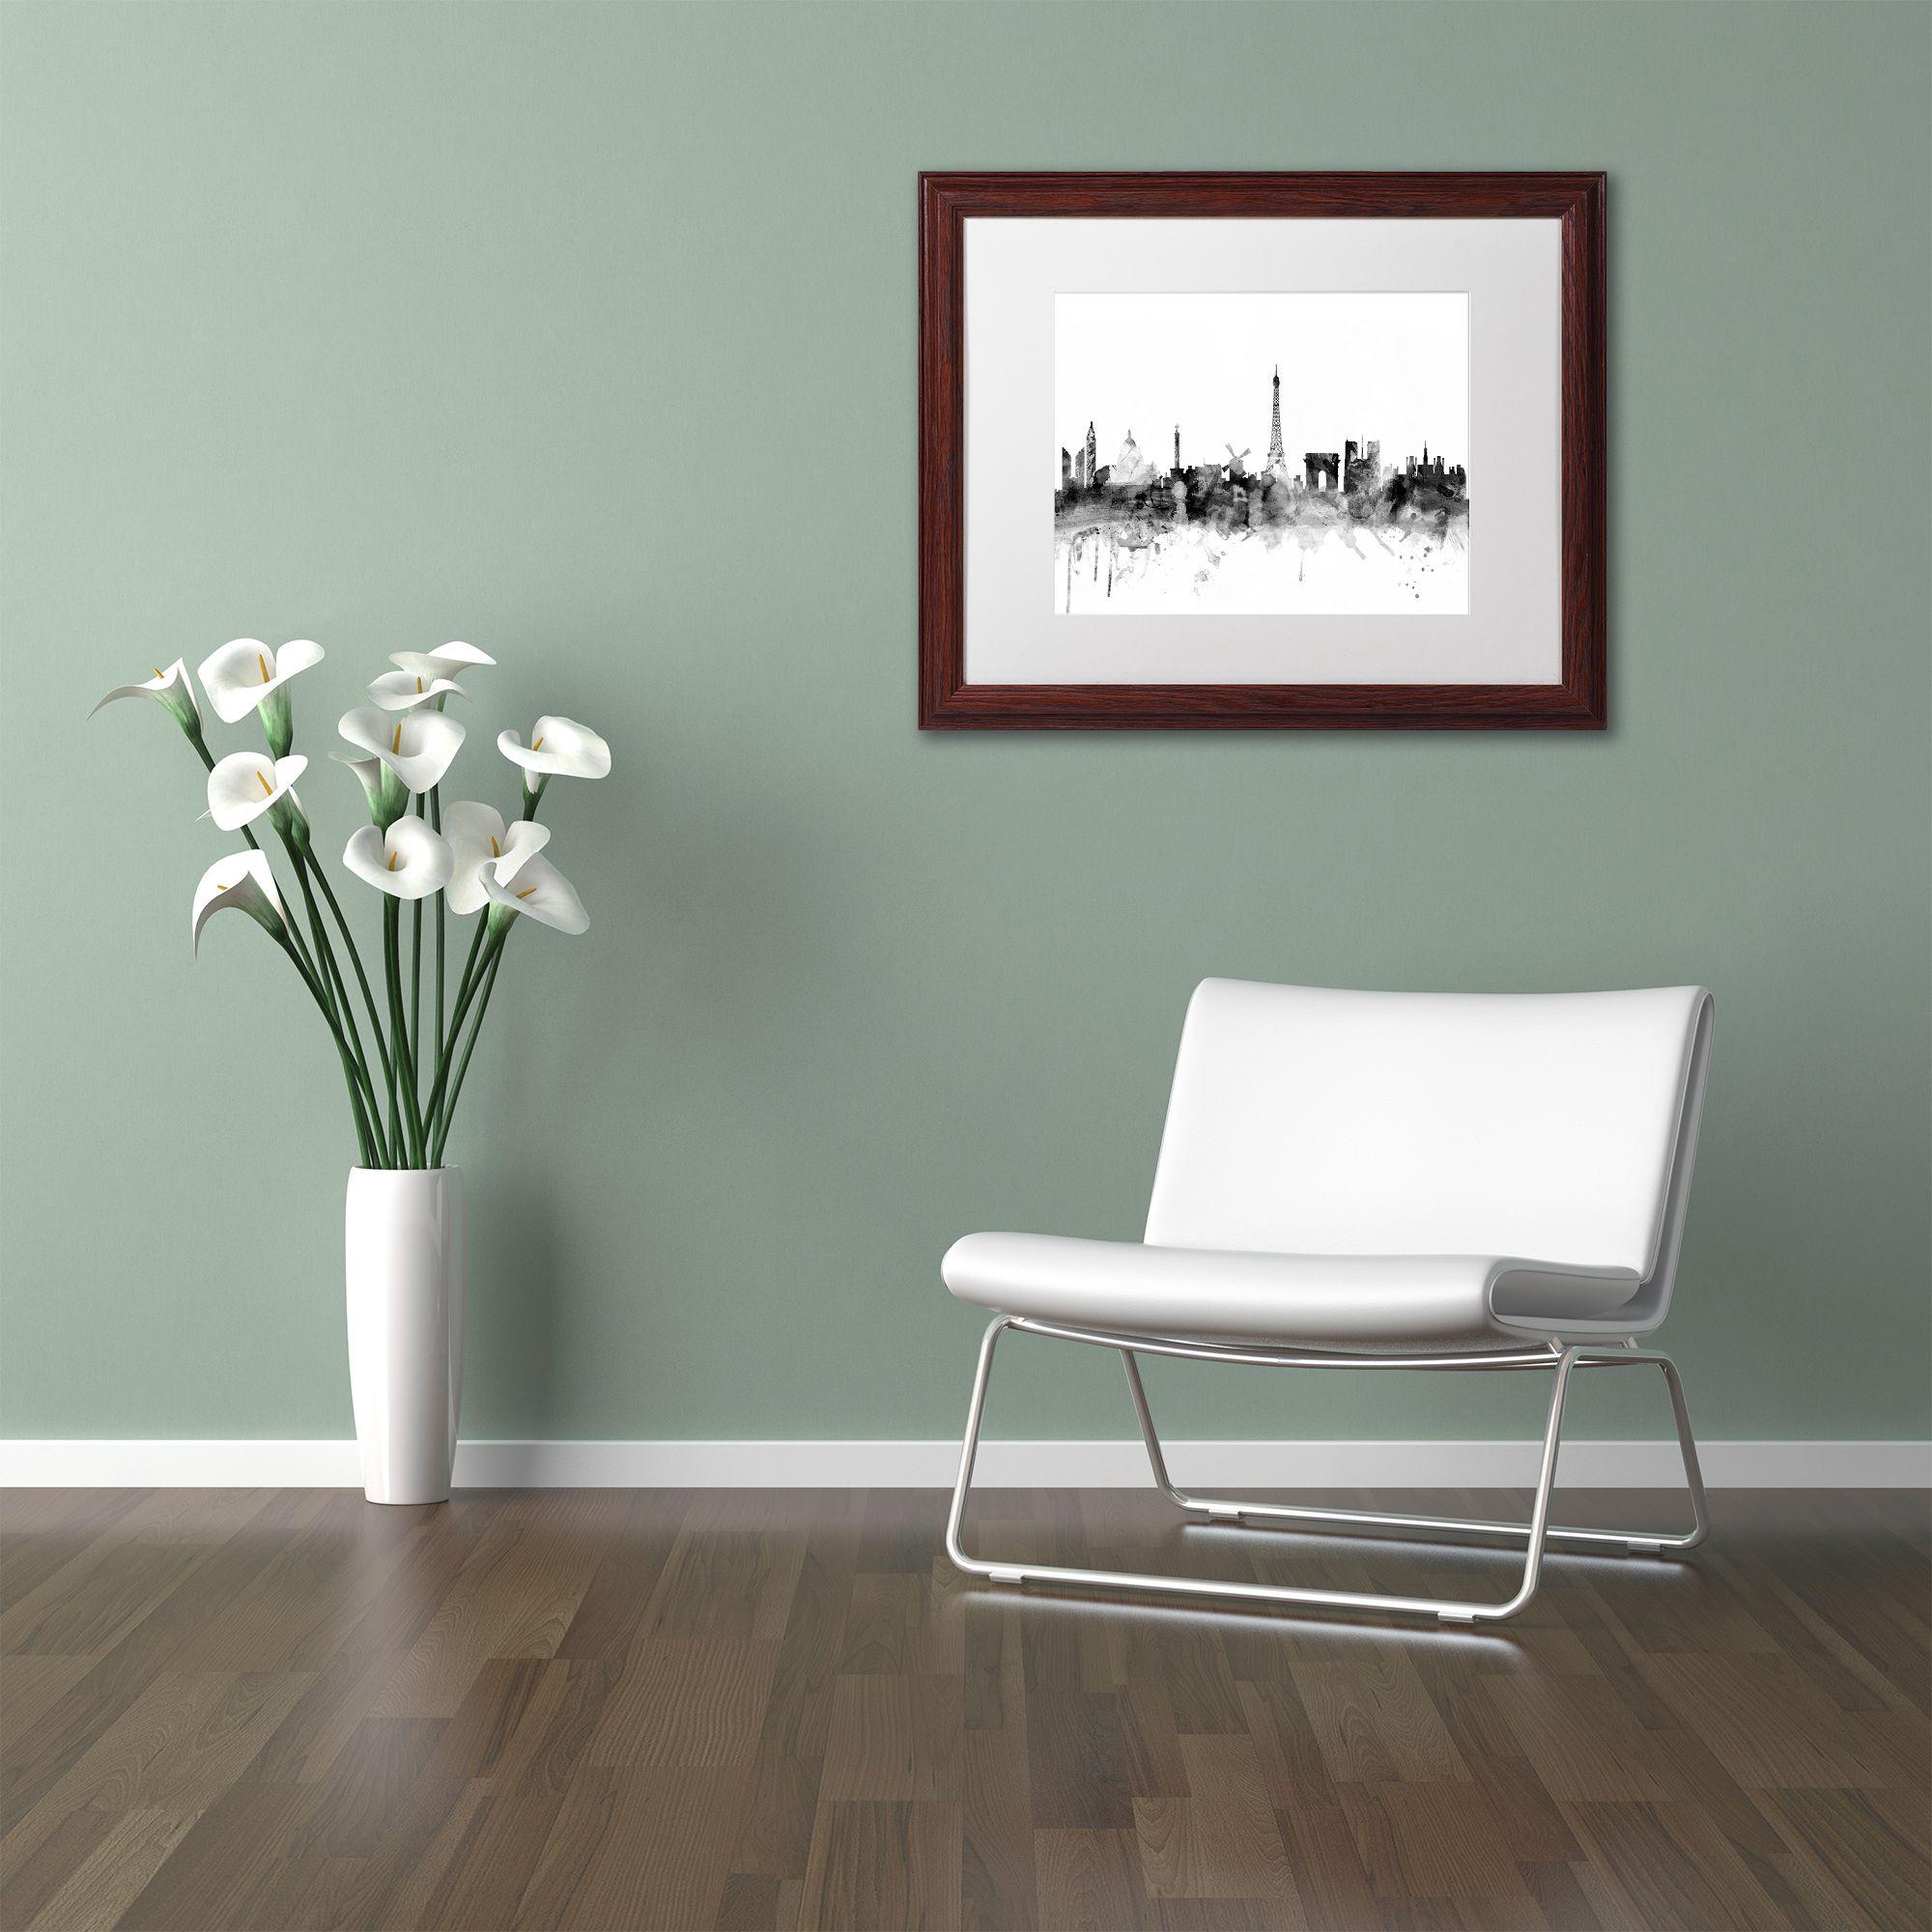 Michael tompsett uparis skyline buwu matted framed art products